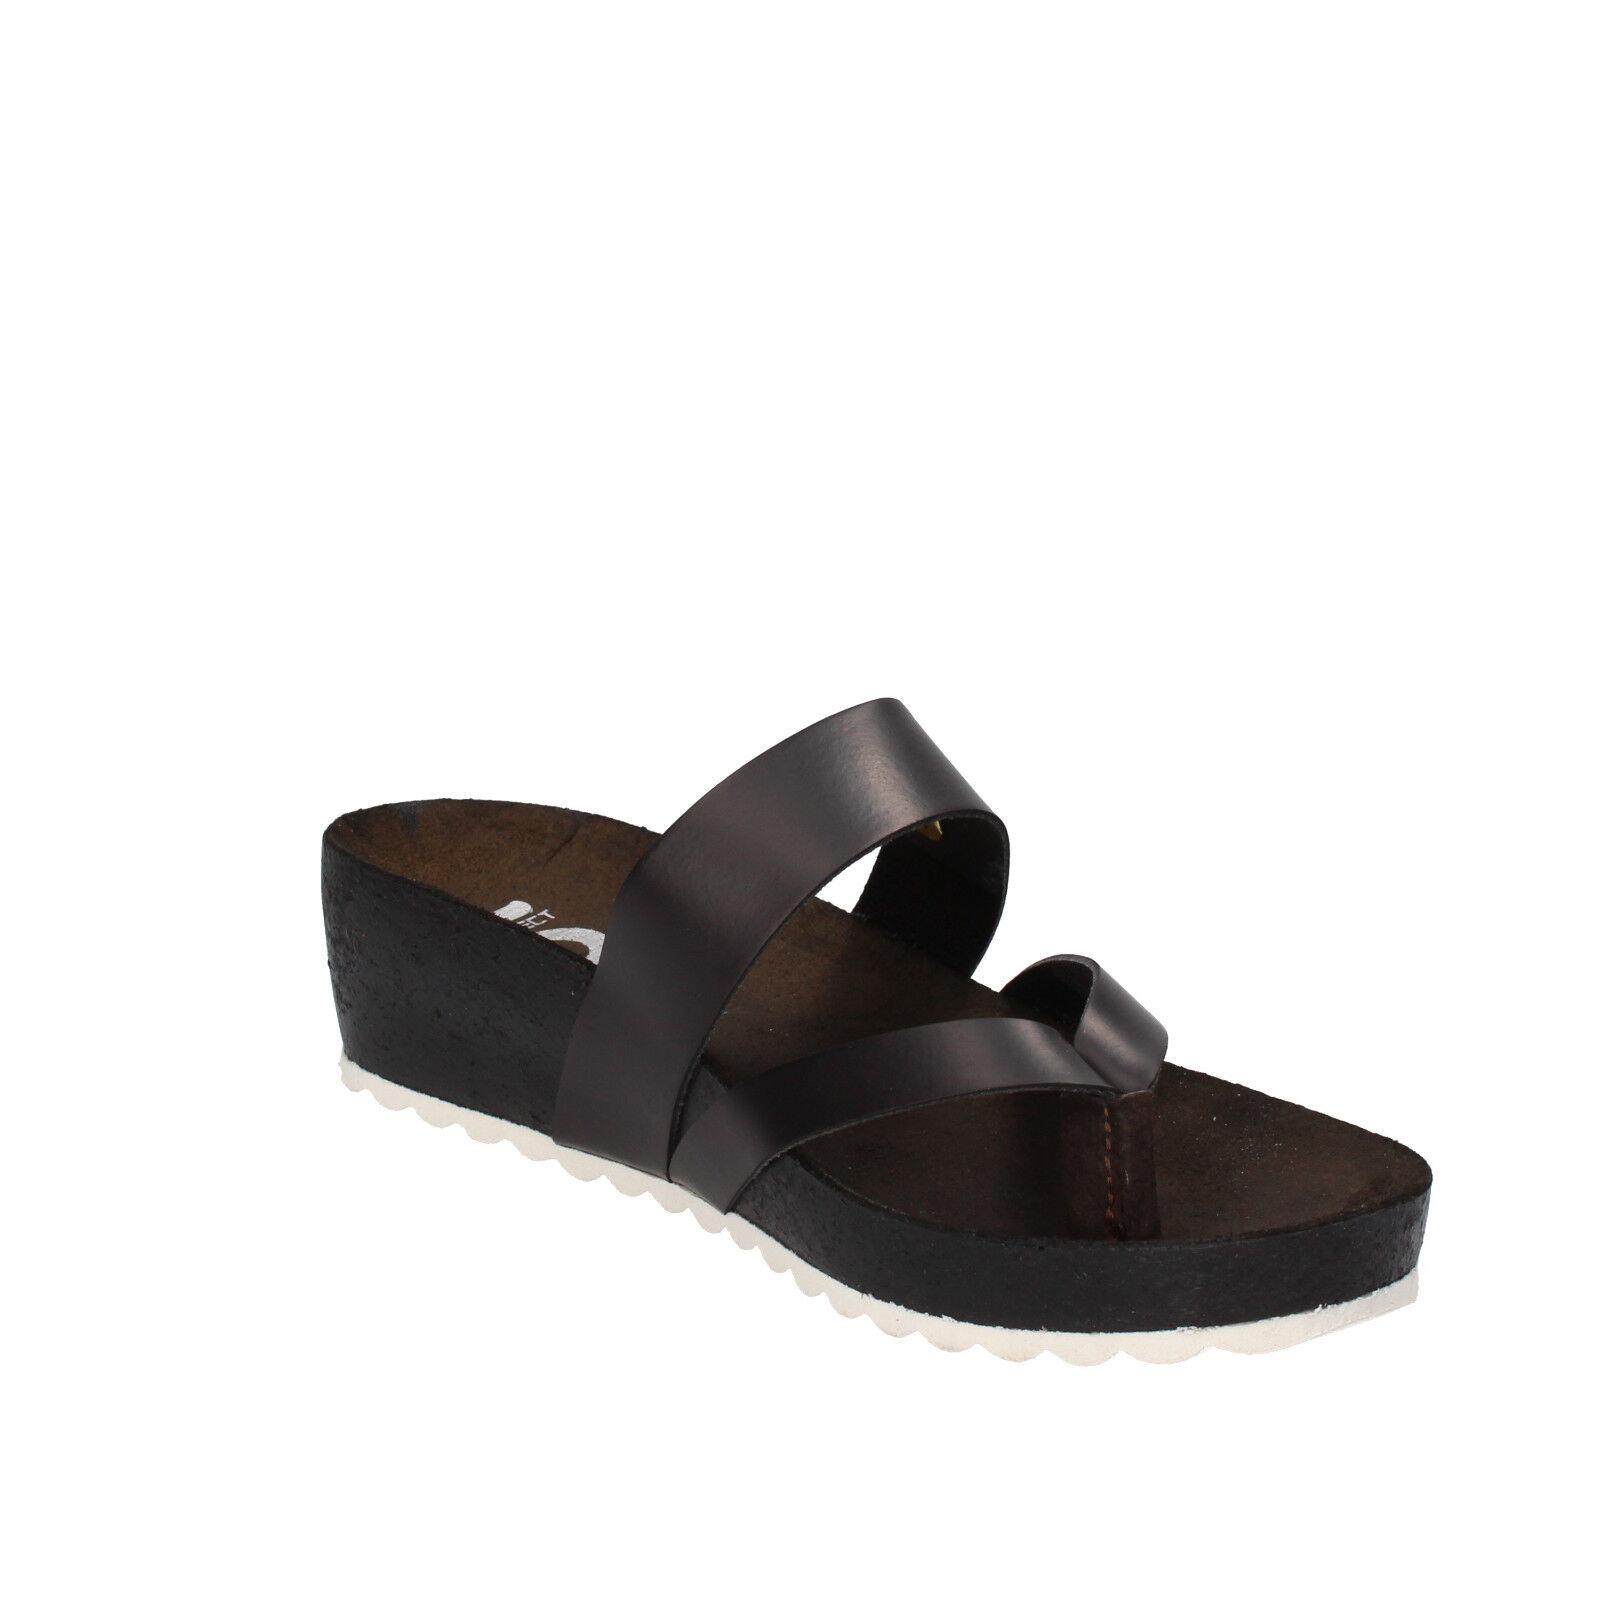 EU donna 5 PRO JECT 38 EU  sandali nero pelle AC598-D 8c9db2